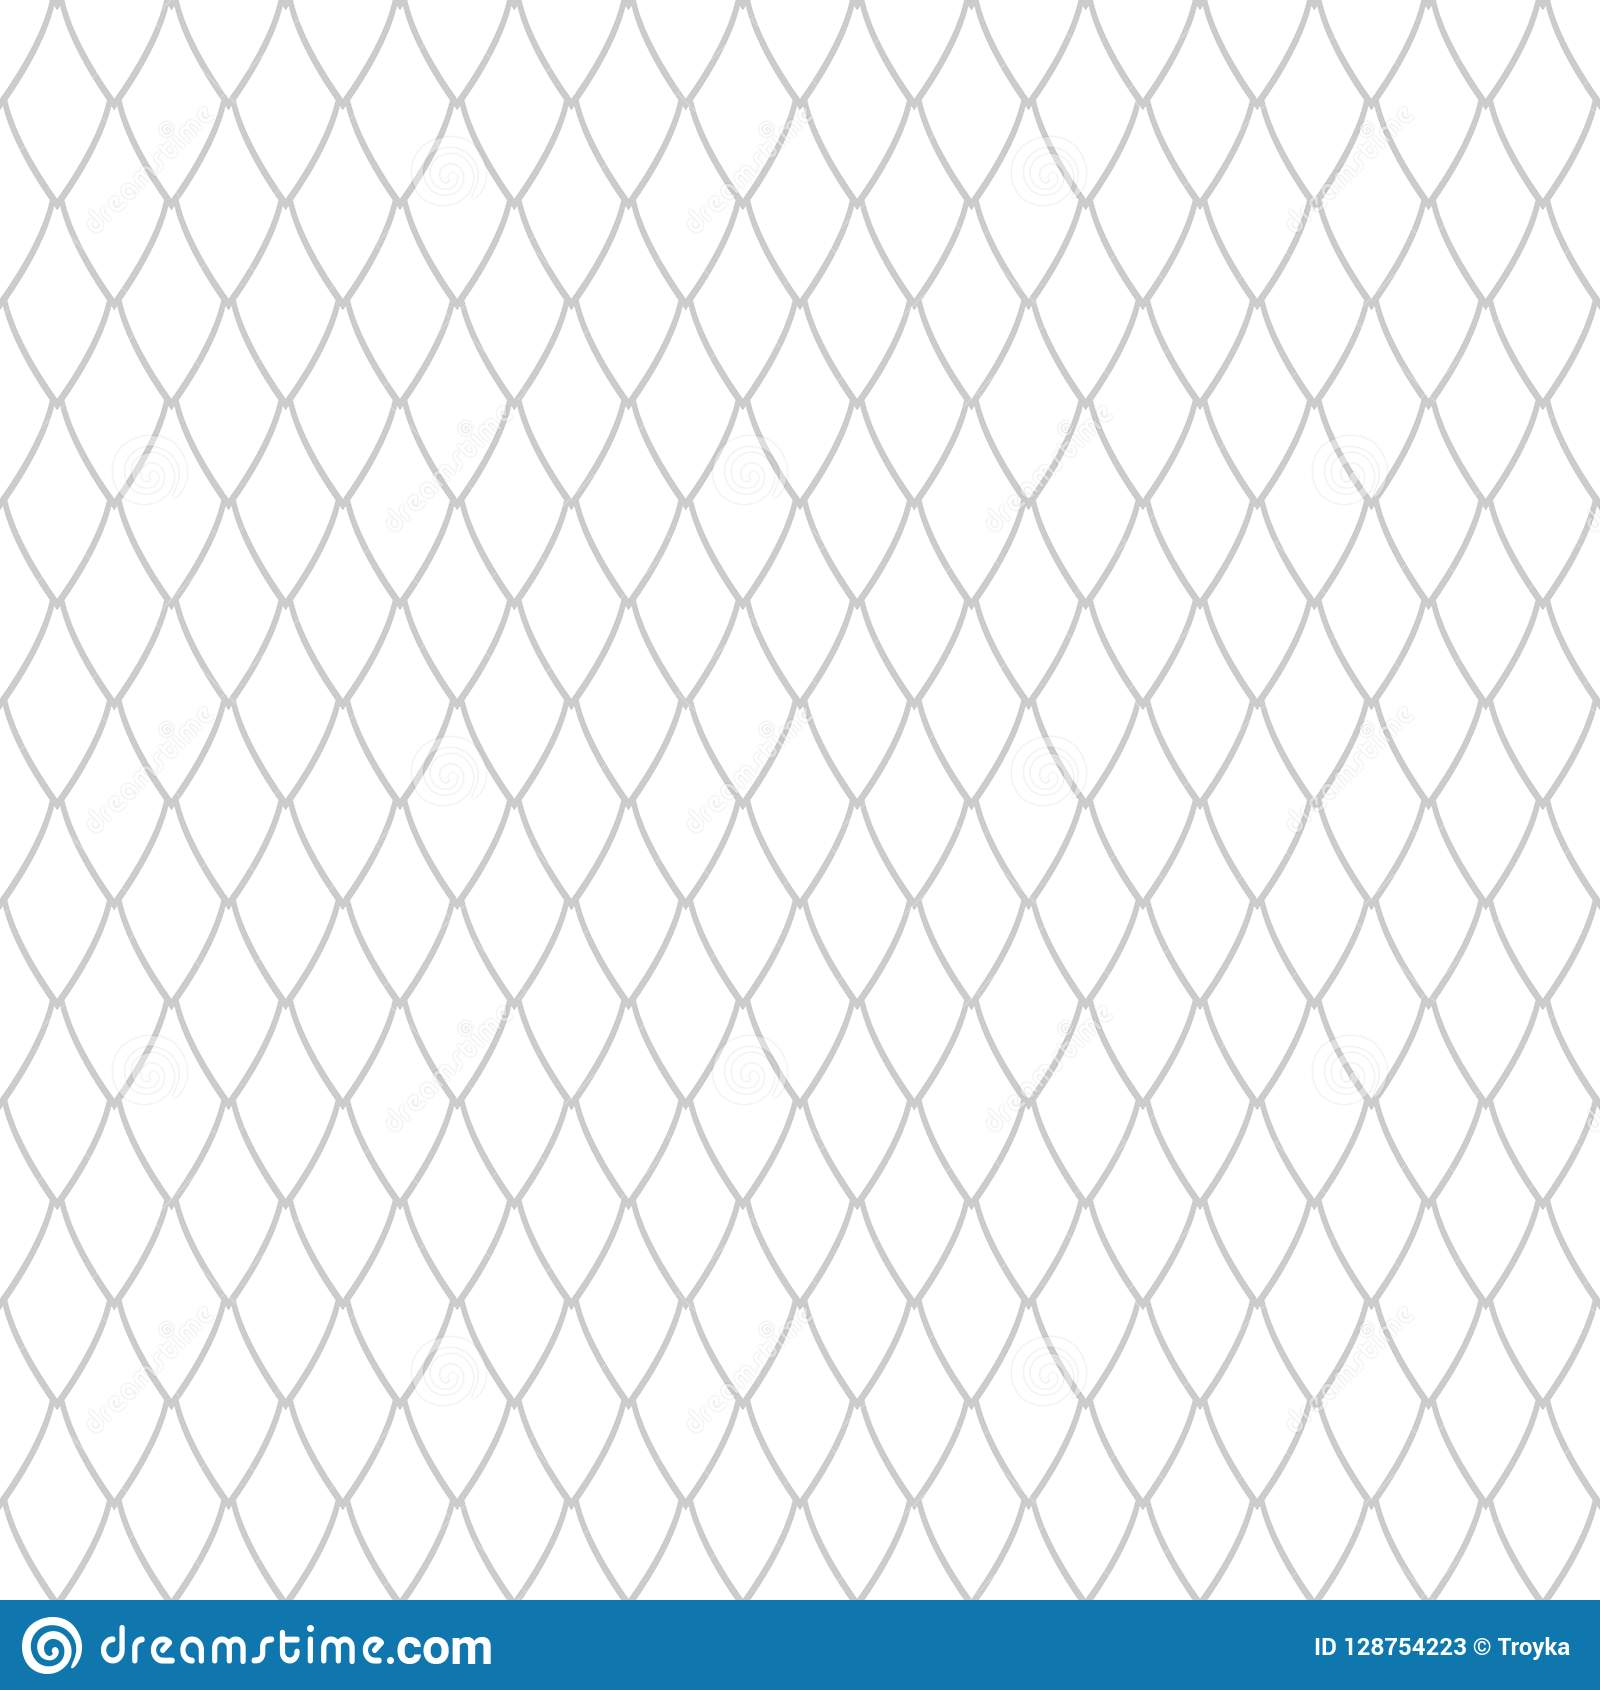 Seamless Net Pattern. Latticed Texture. Stock Vector ...